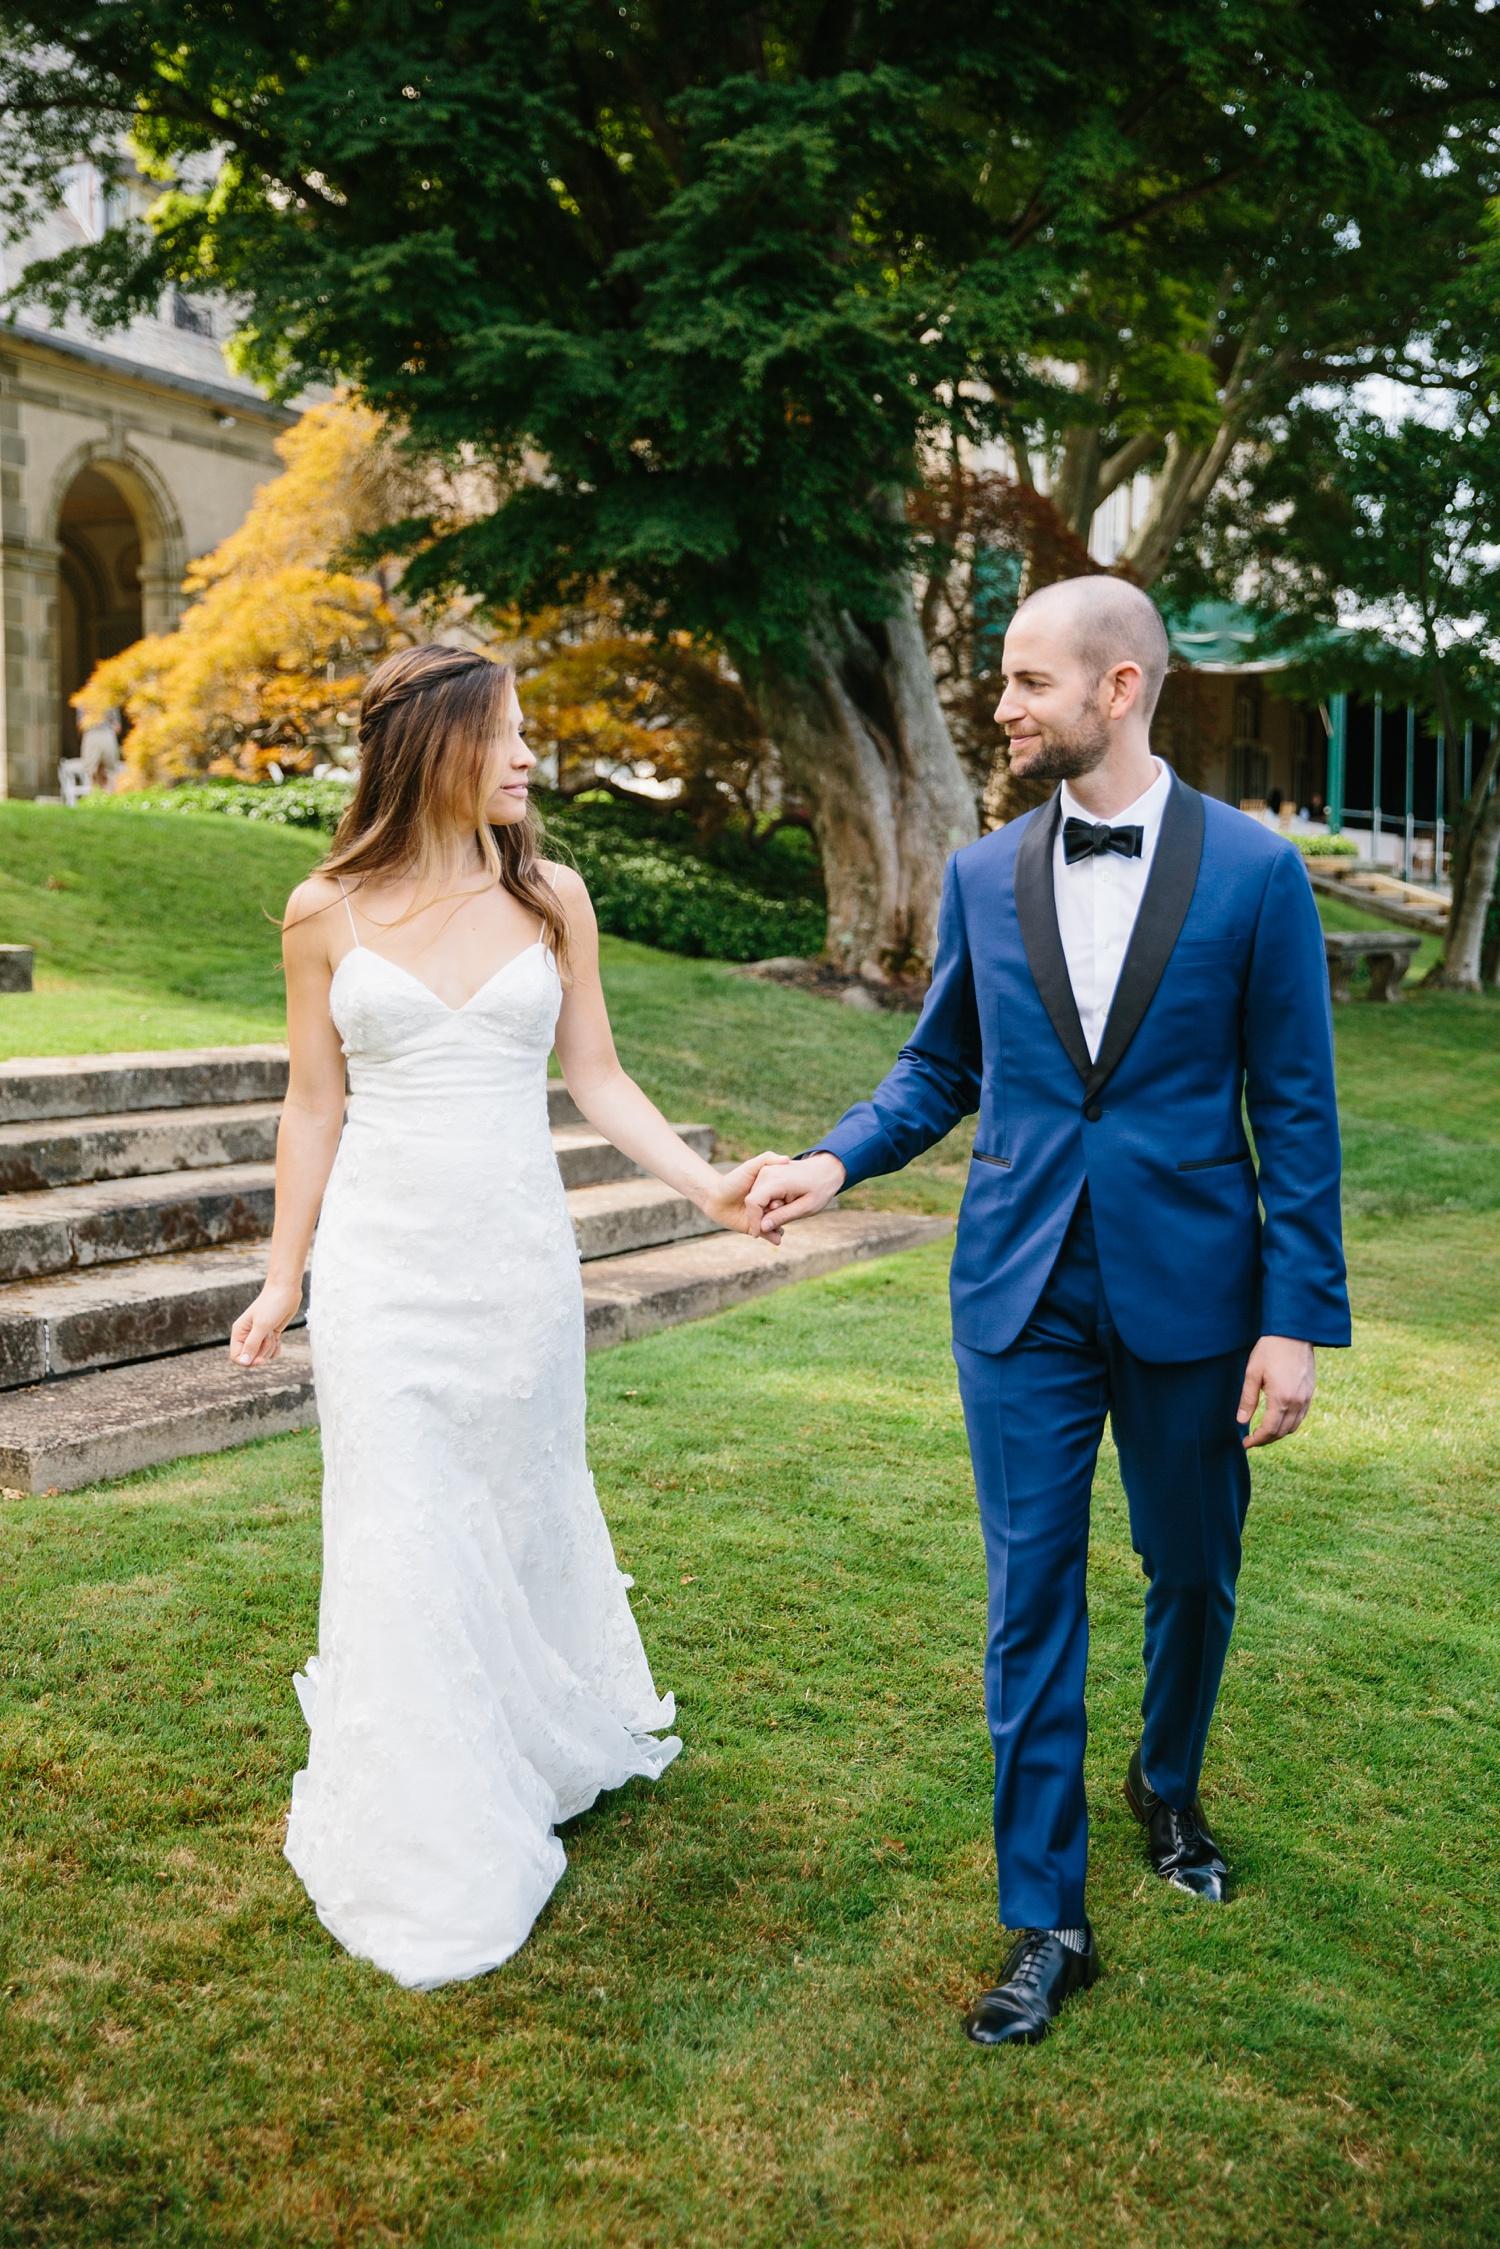 Daniel_Sarah_Glen_Manor_House_Wedding_006.jpeg